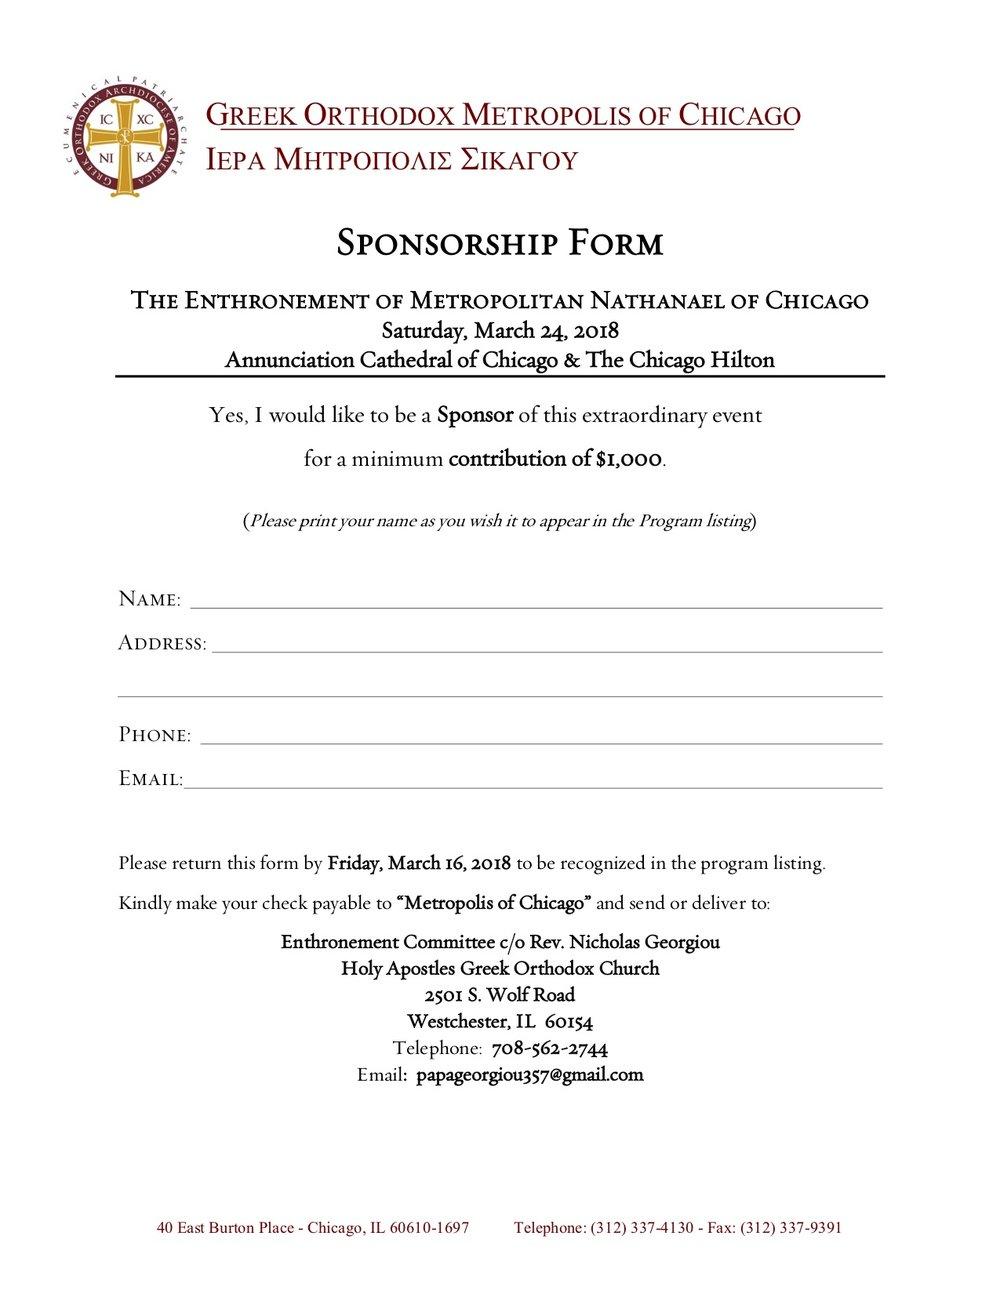 Sponsorship Form.jpg